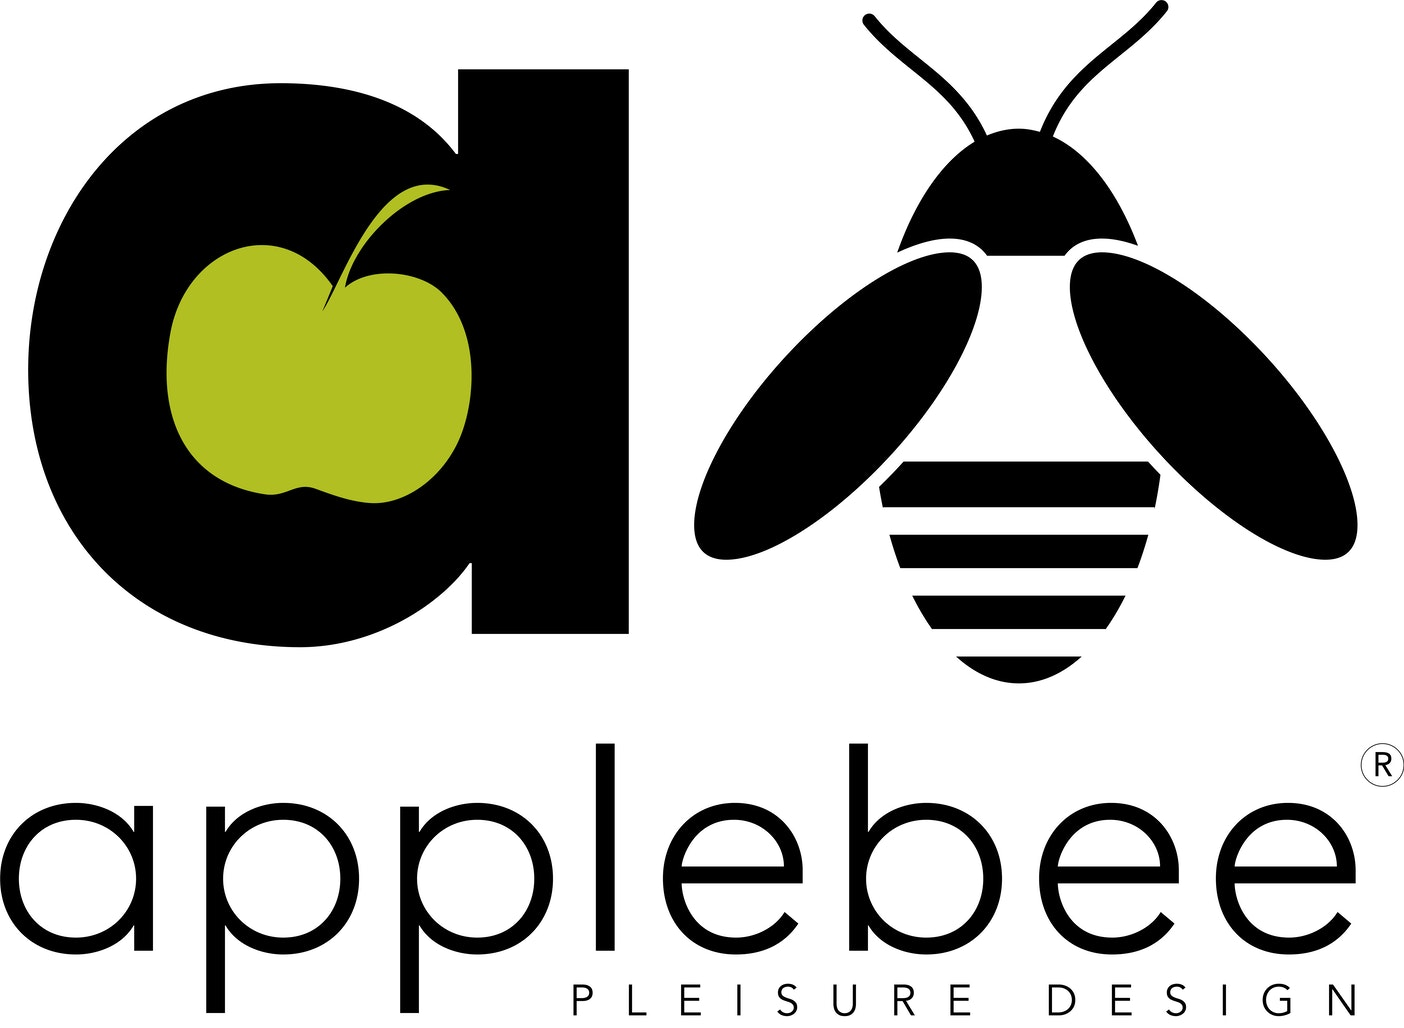 https://assets.koempf24.de/Apple_Bee_Square_logo.jpg?auto=format&fit=max&h=800&q=75&w=1110&s=c7be66f6f6beb42a6ab60c5ab15f8e32